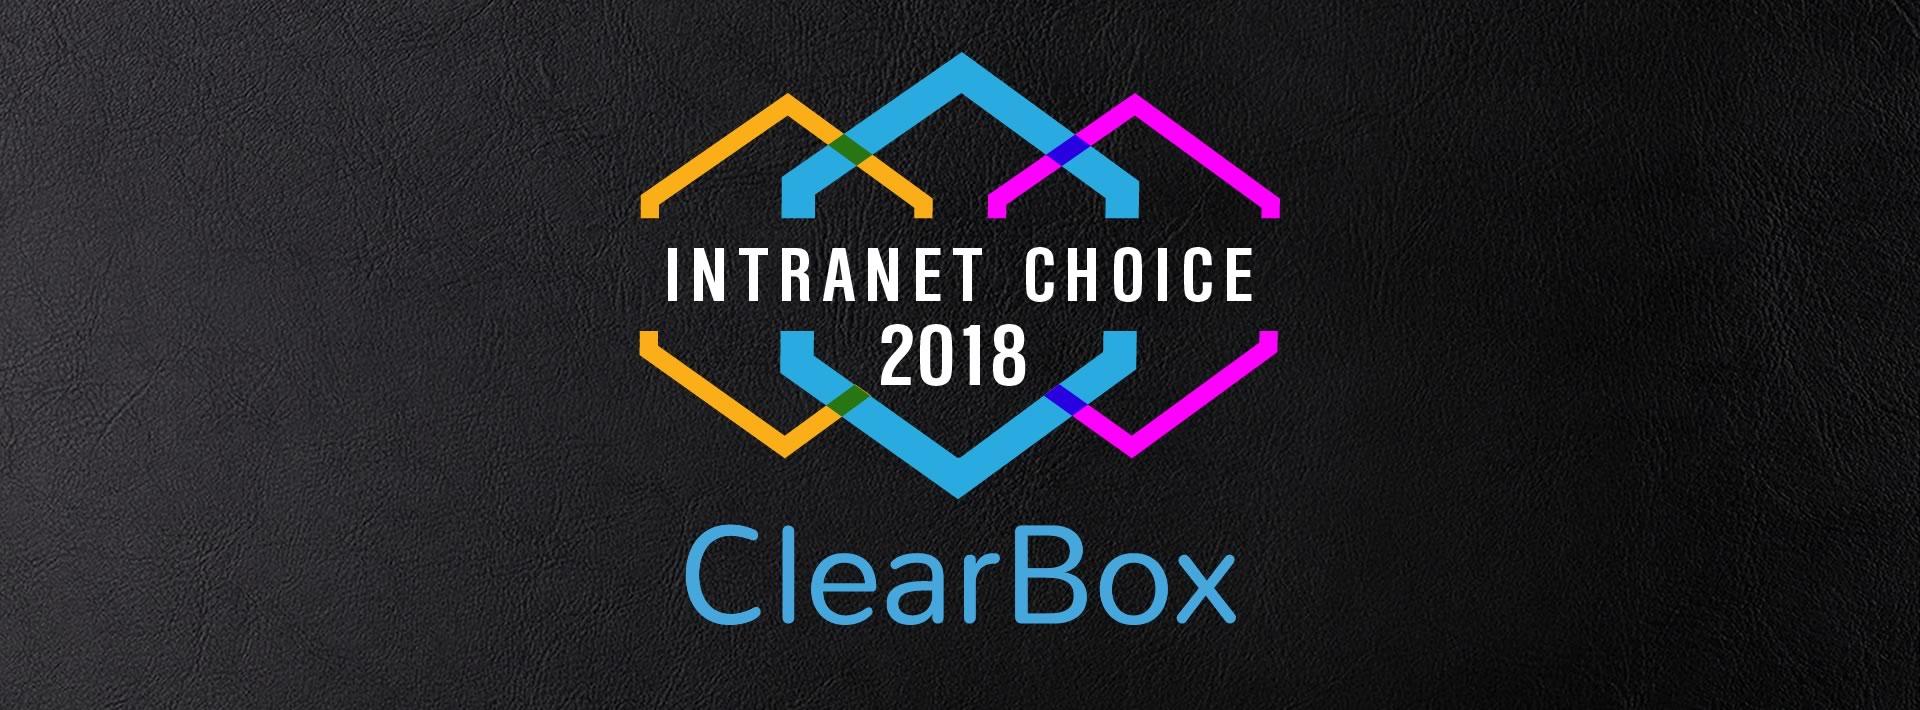 Intranet Choice 2018